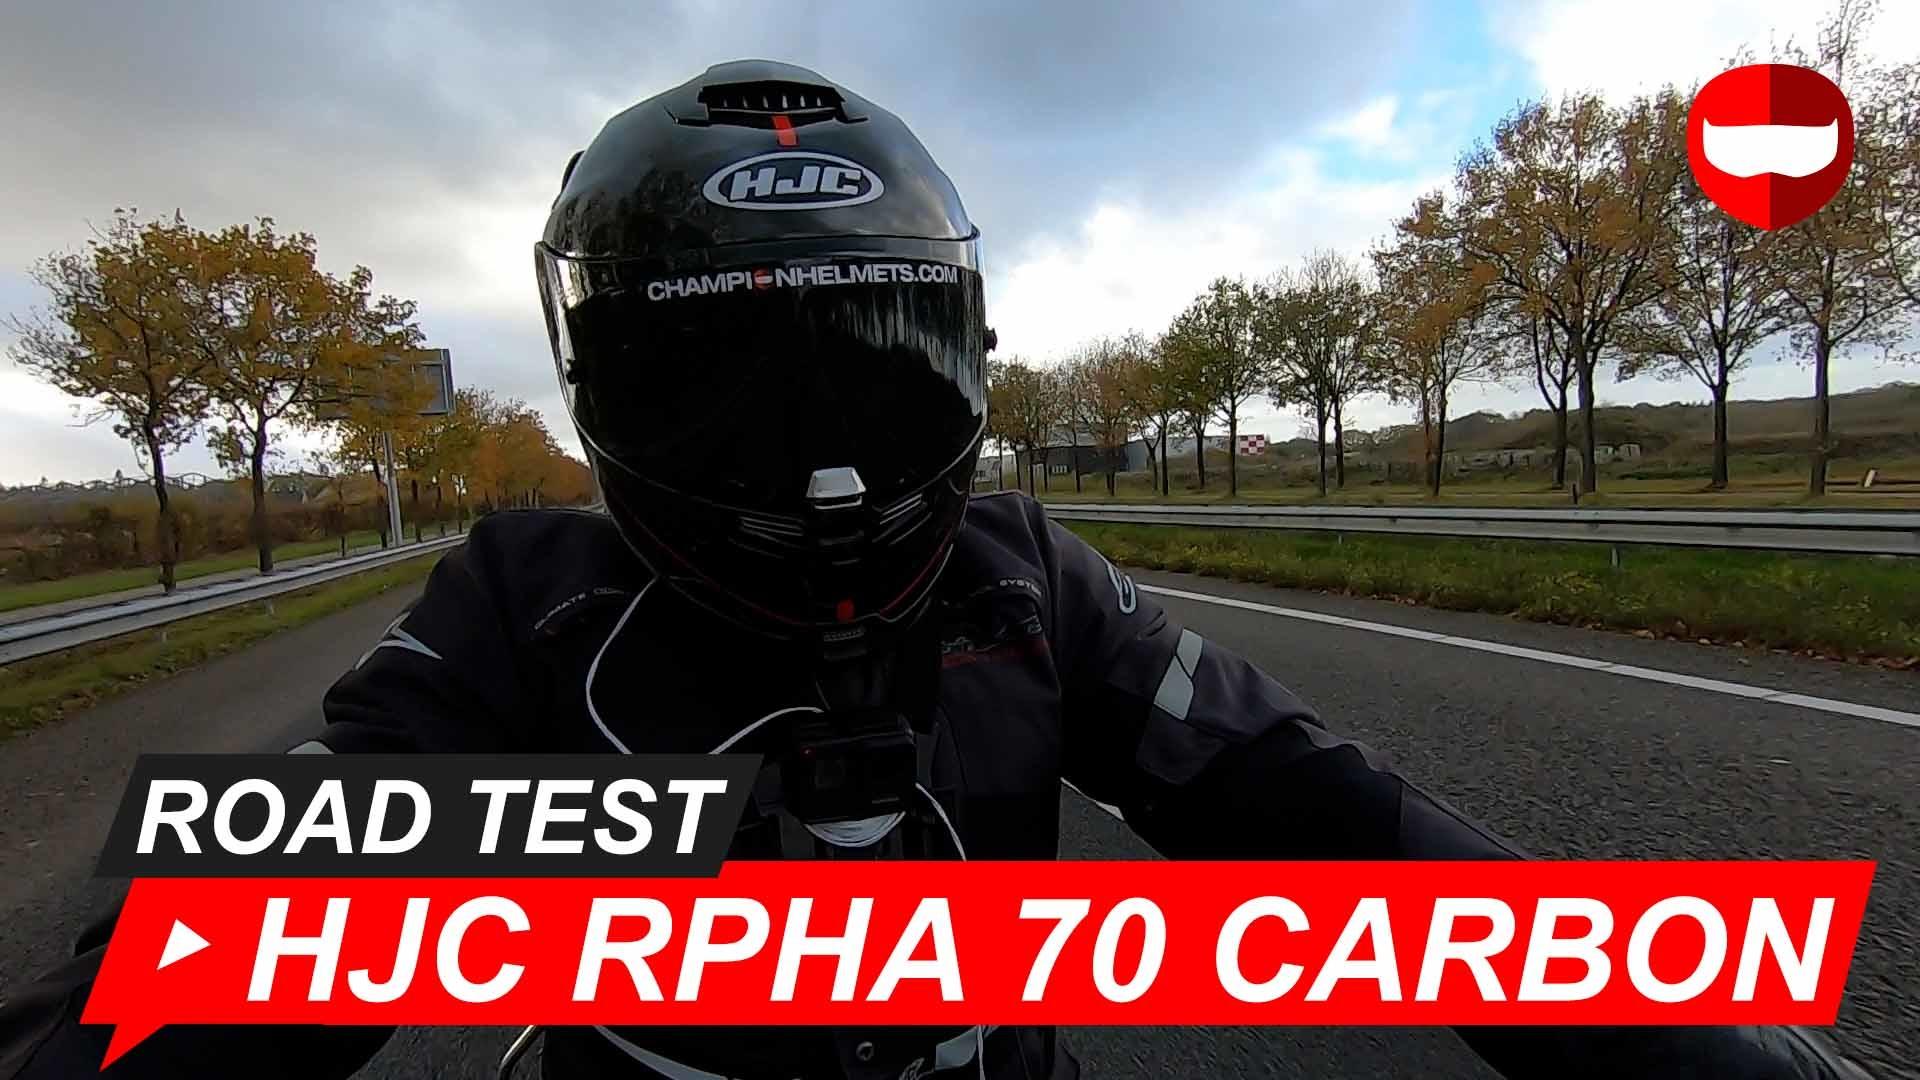 HJC RPHA 70 Carbon Road Test + Video